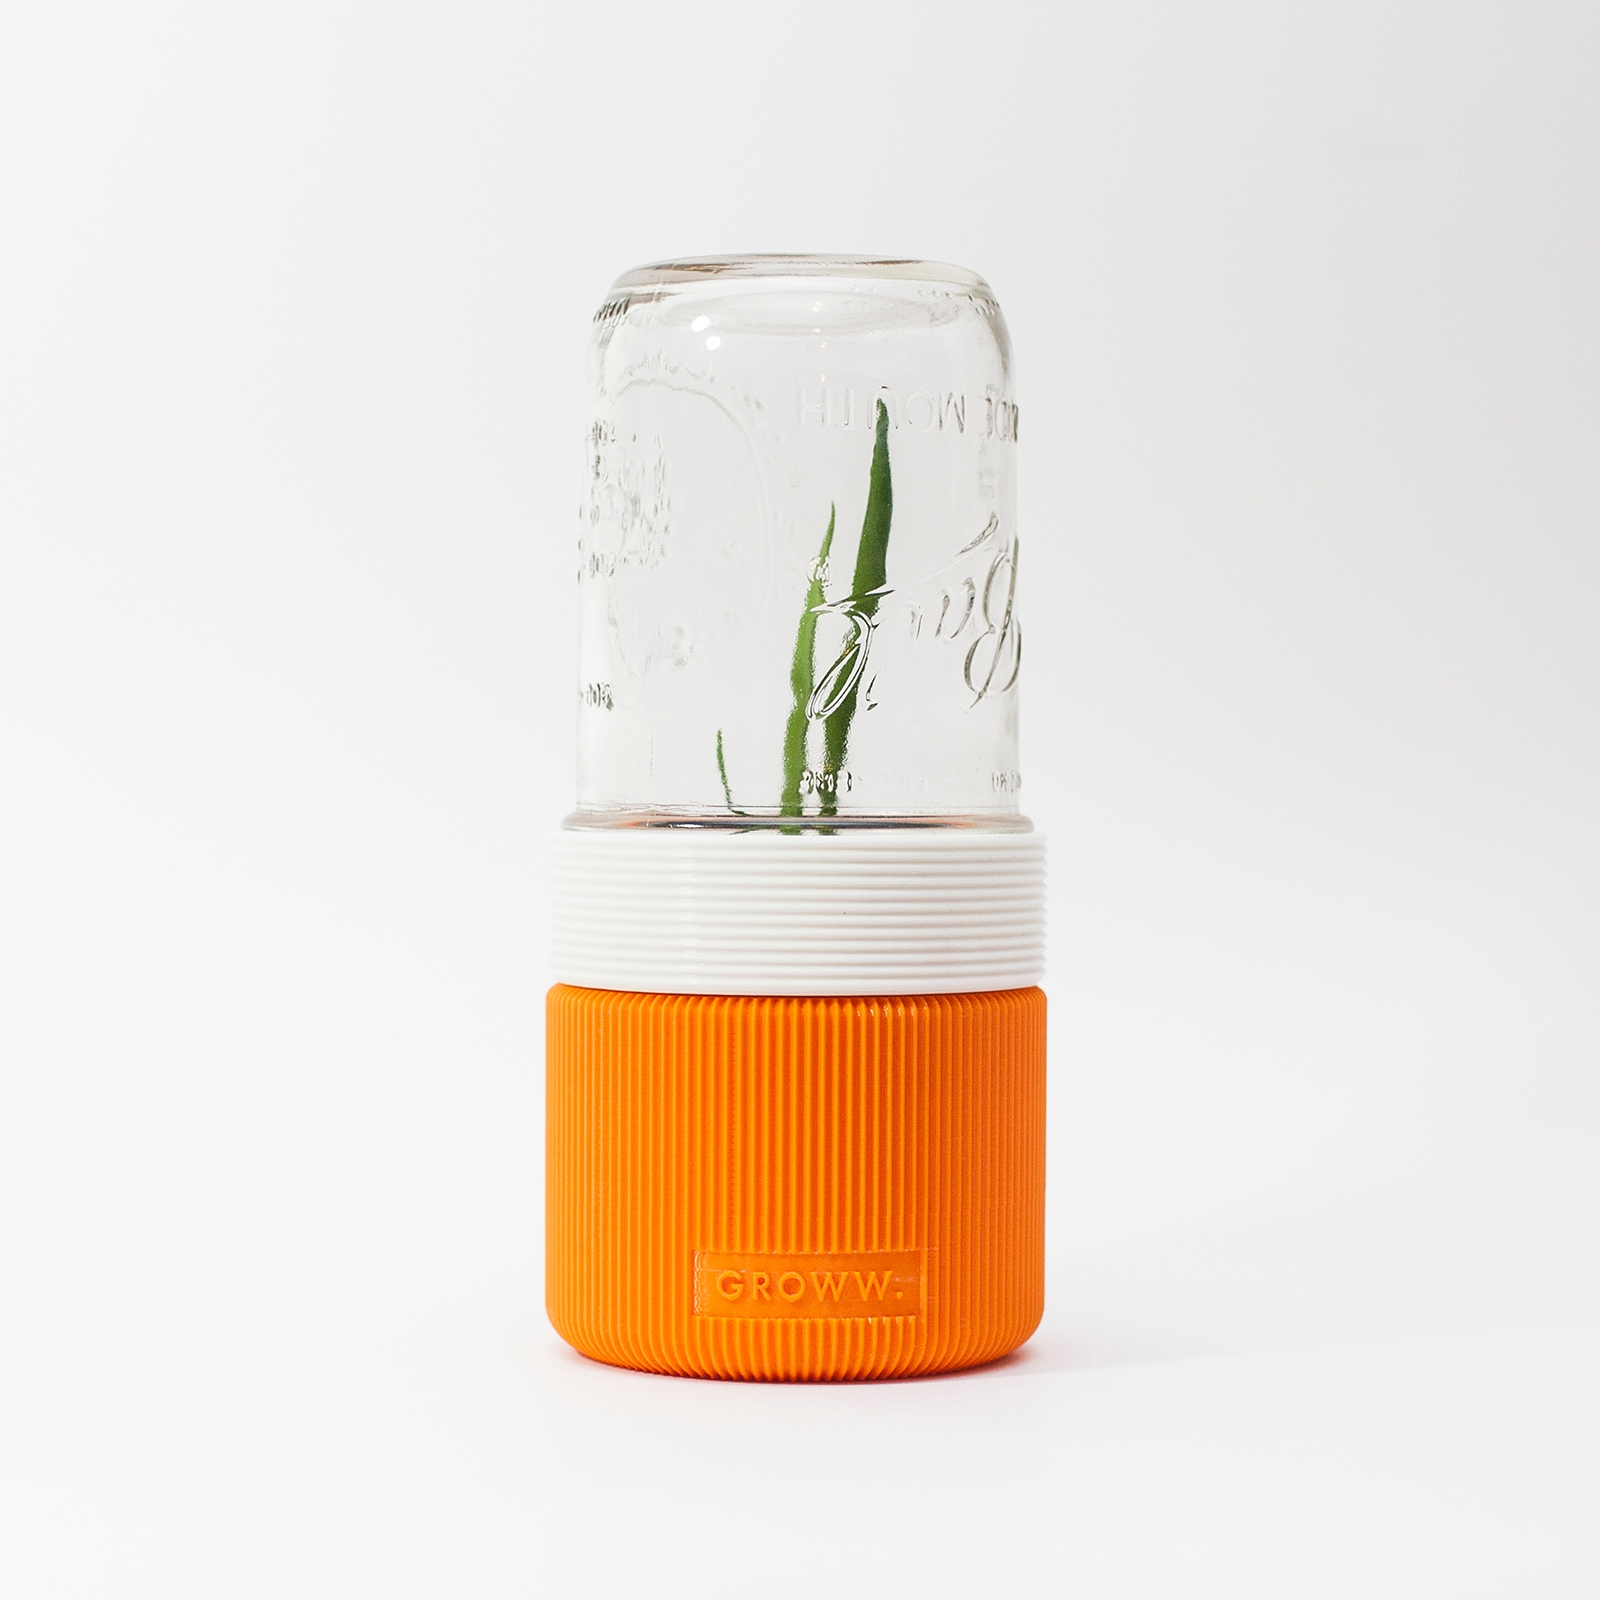 GROWW. minimalistic 3D printed  - uauproject | ello